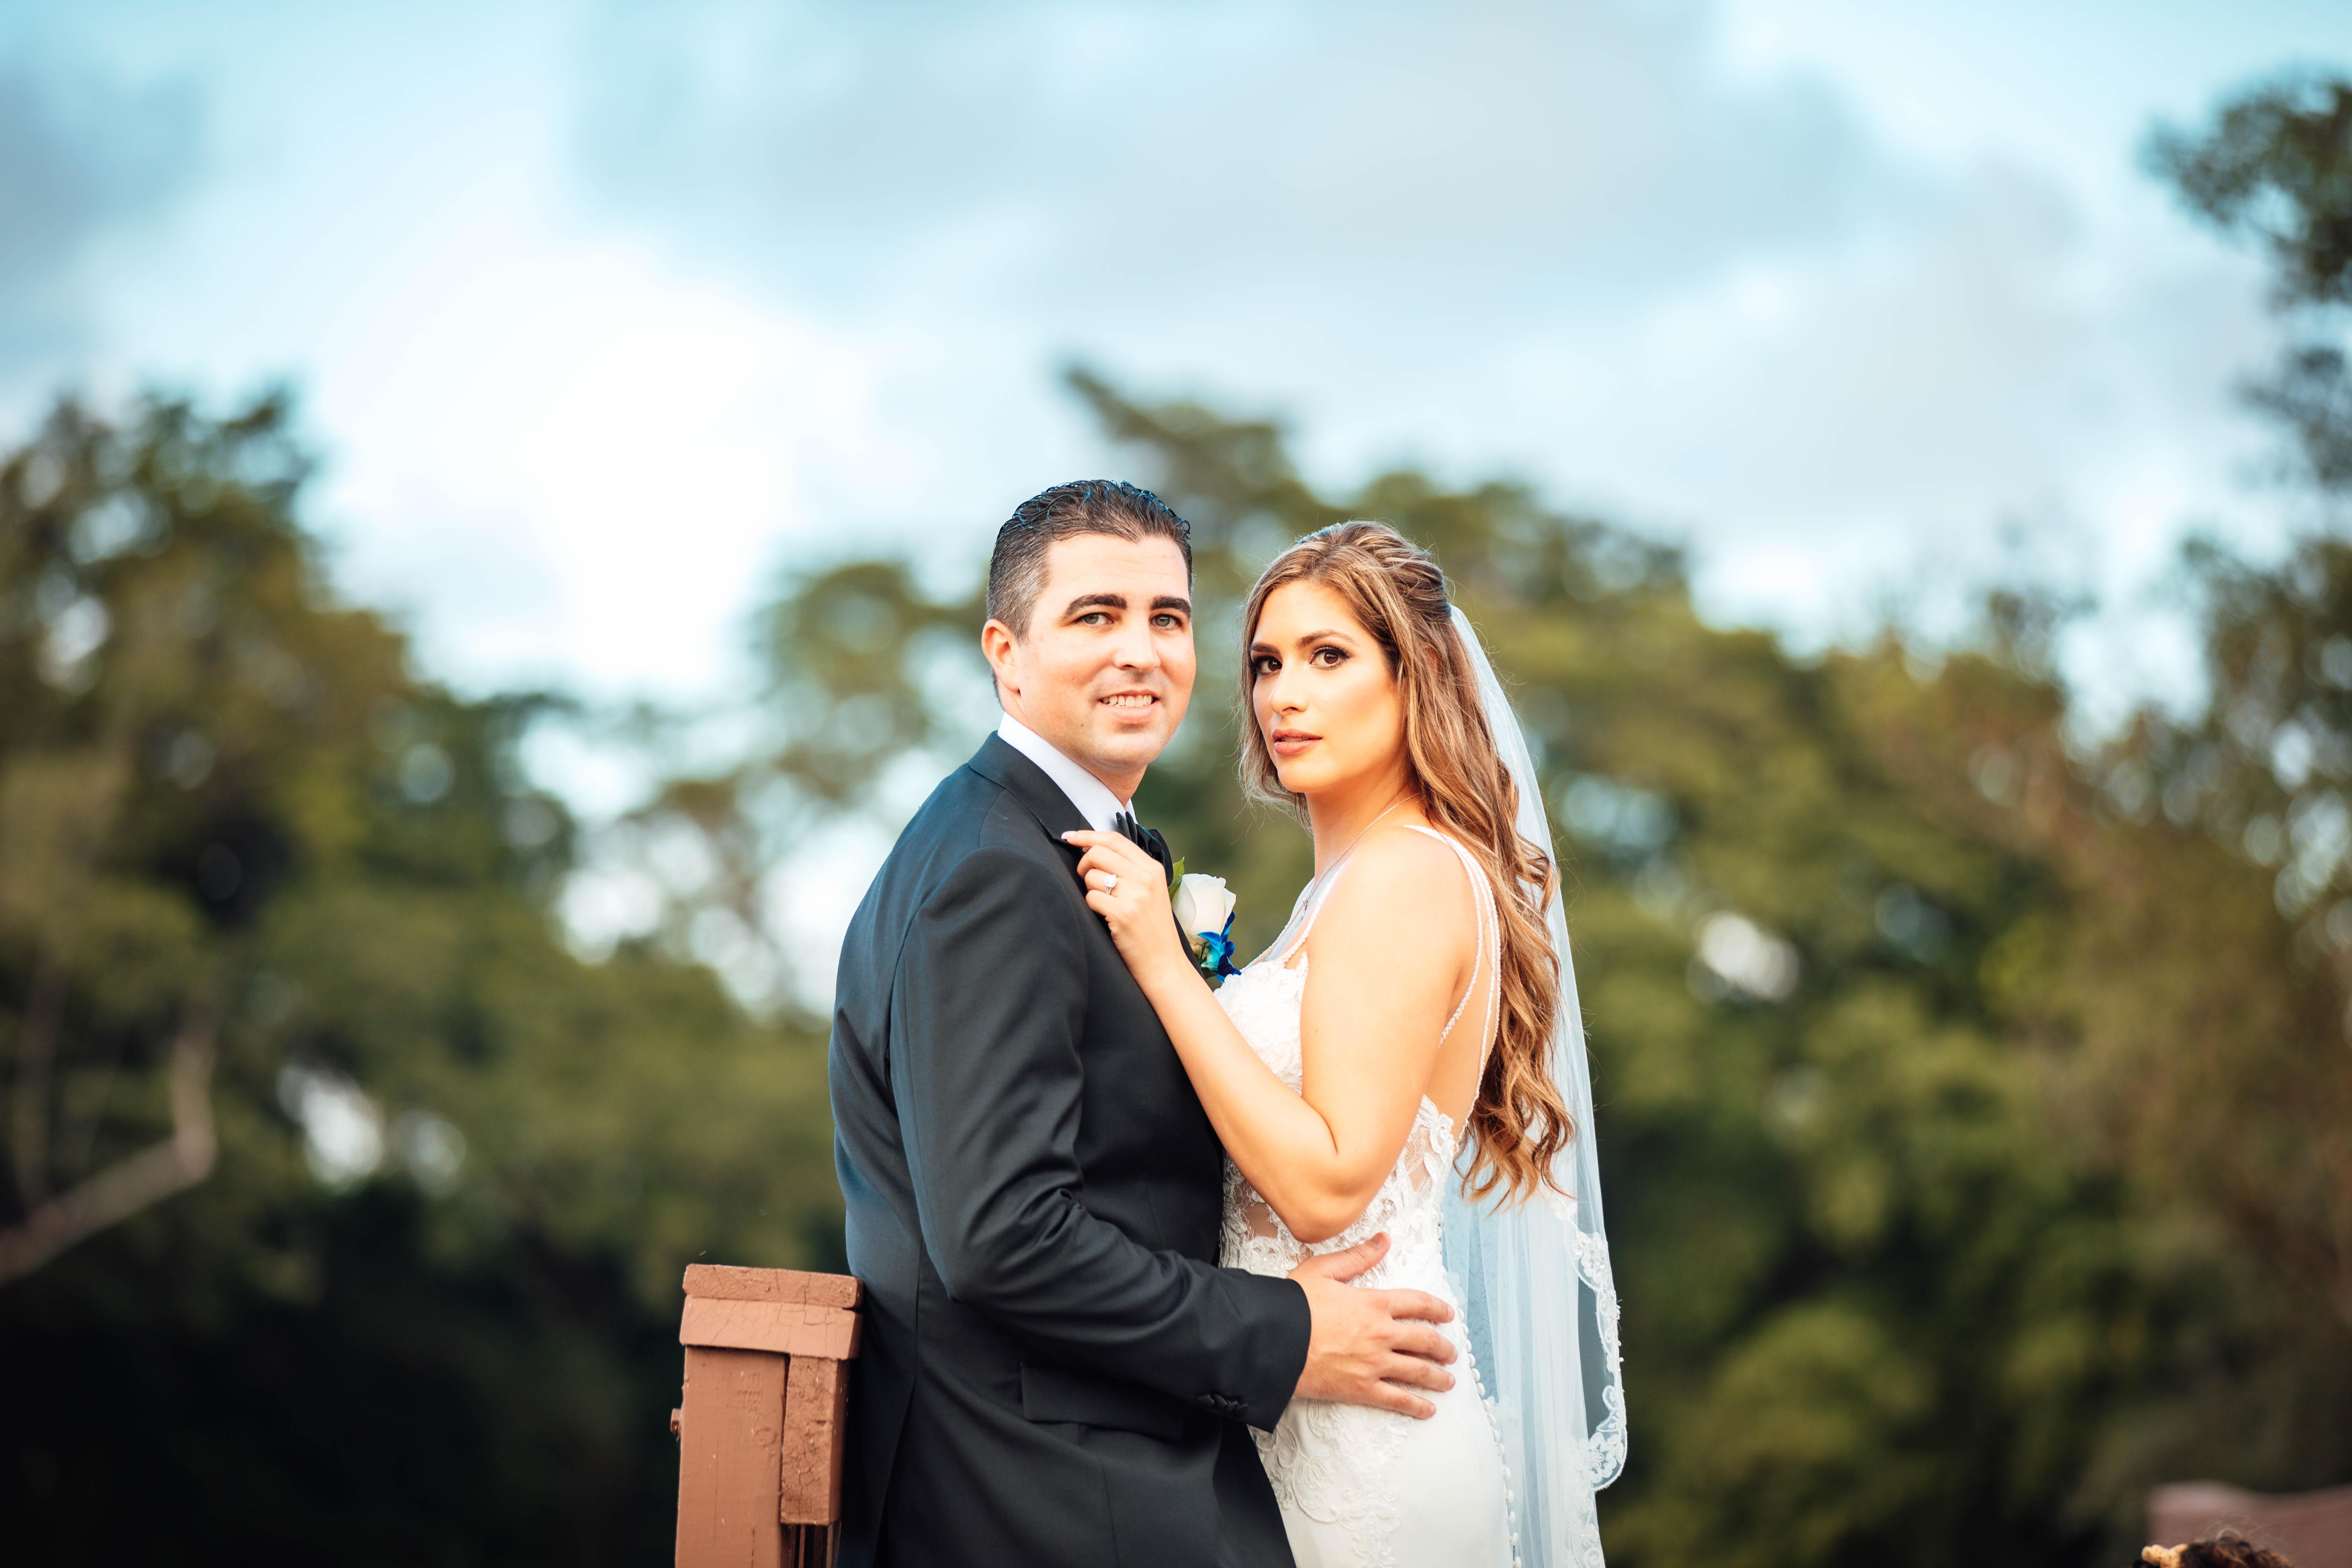 ROSINA-DIBELLO-PHOTO-DEERCREEK-WEDDING-5